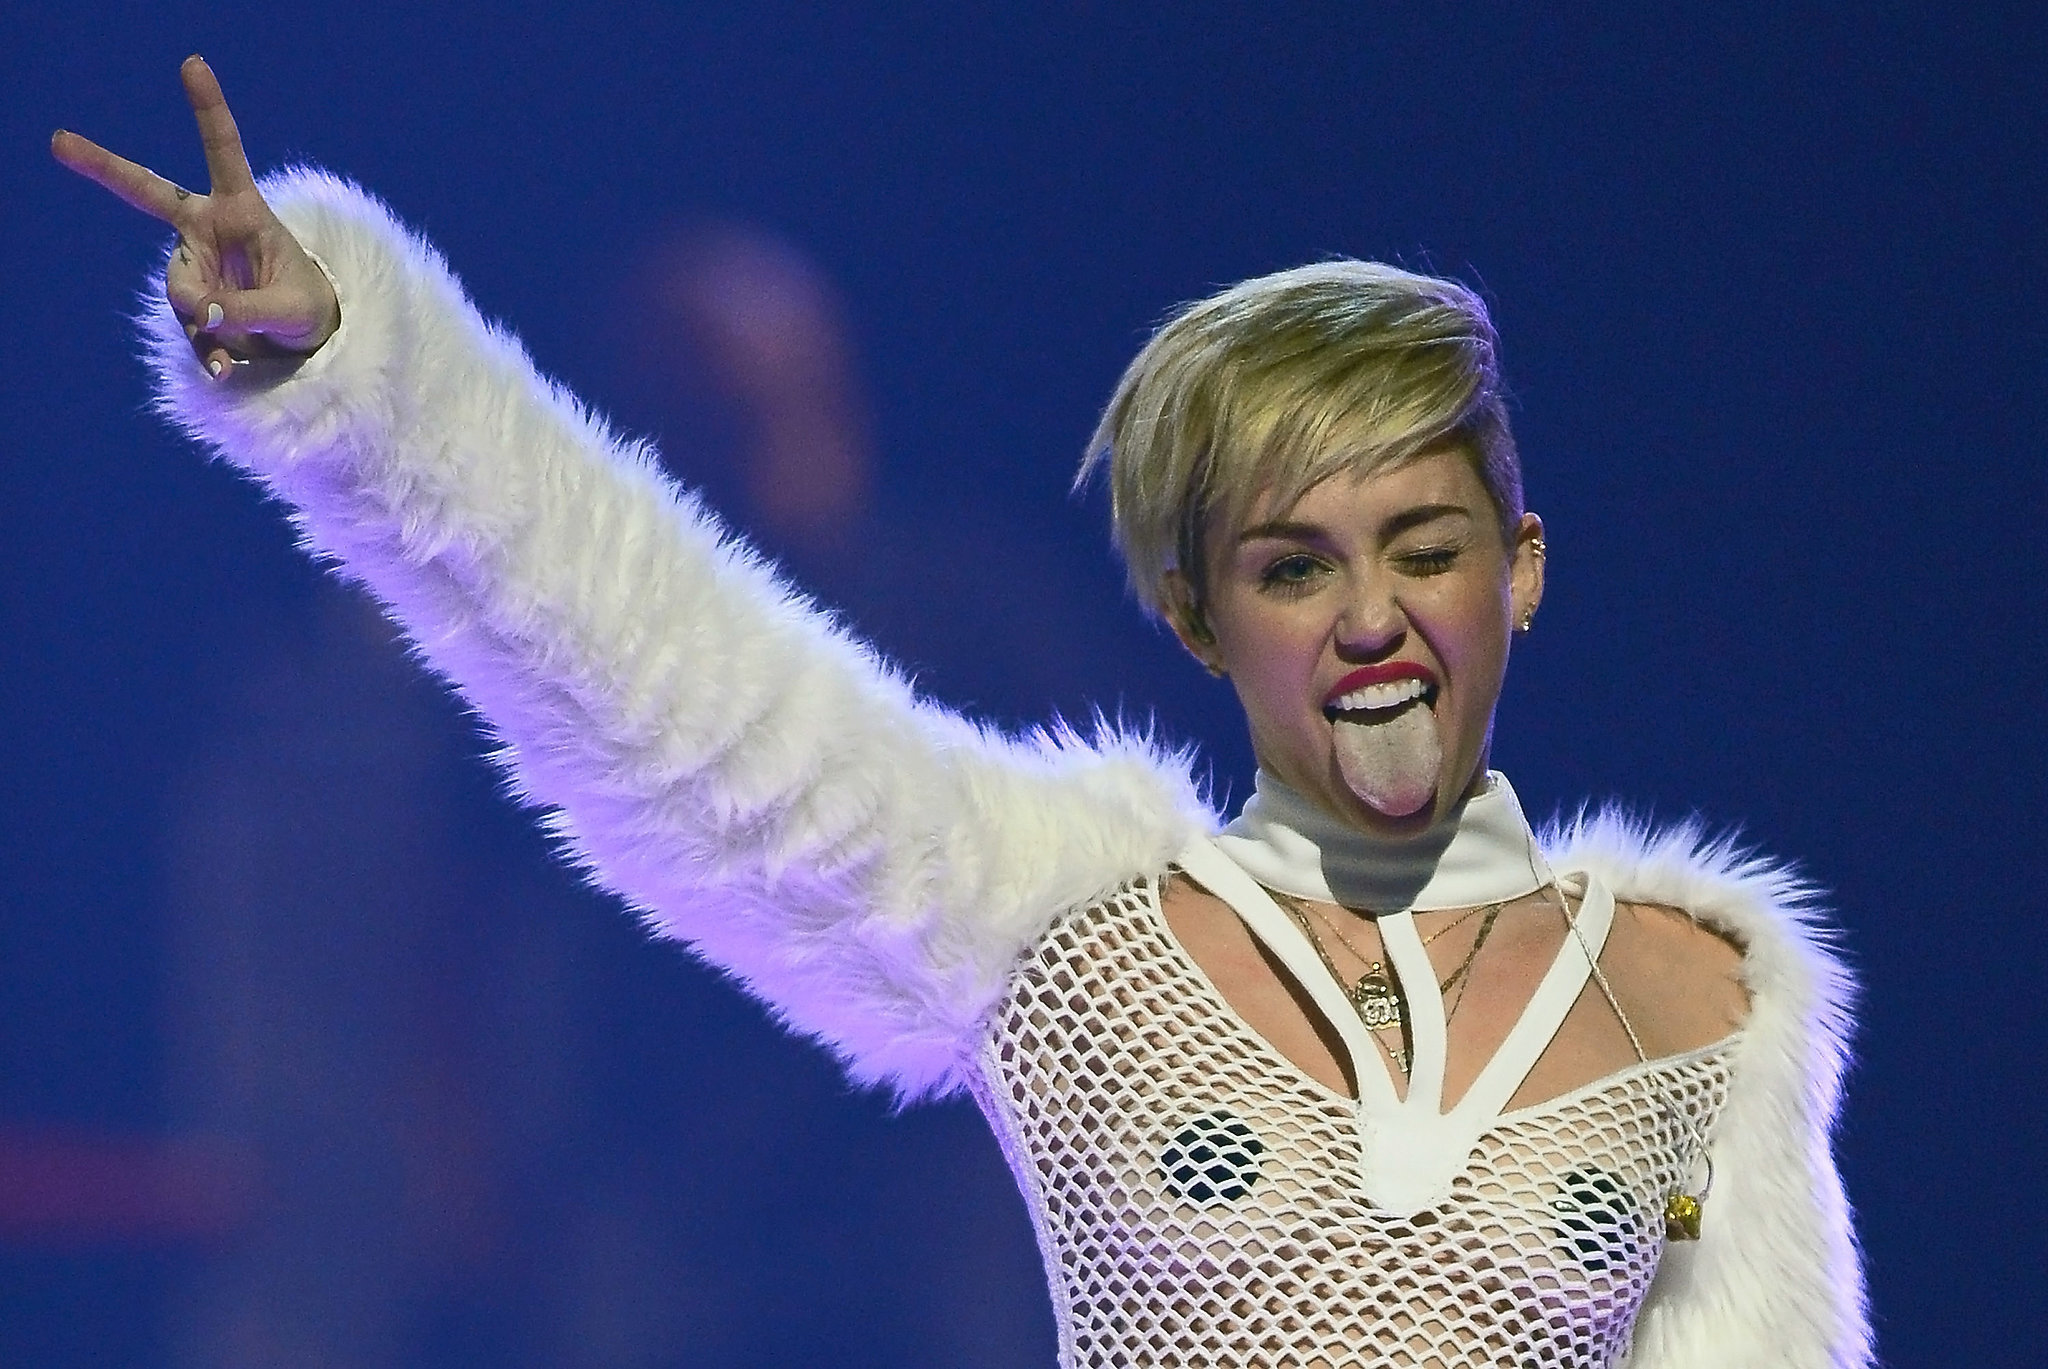 Miley Cyrus =  Destiny Hope Cyrus